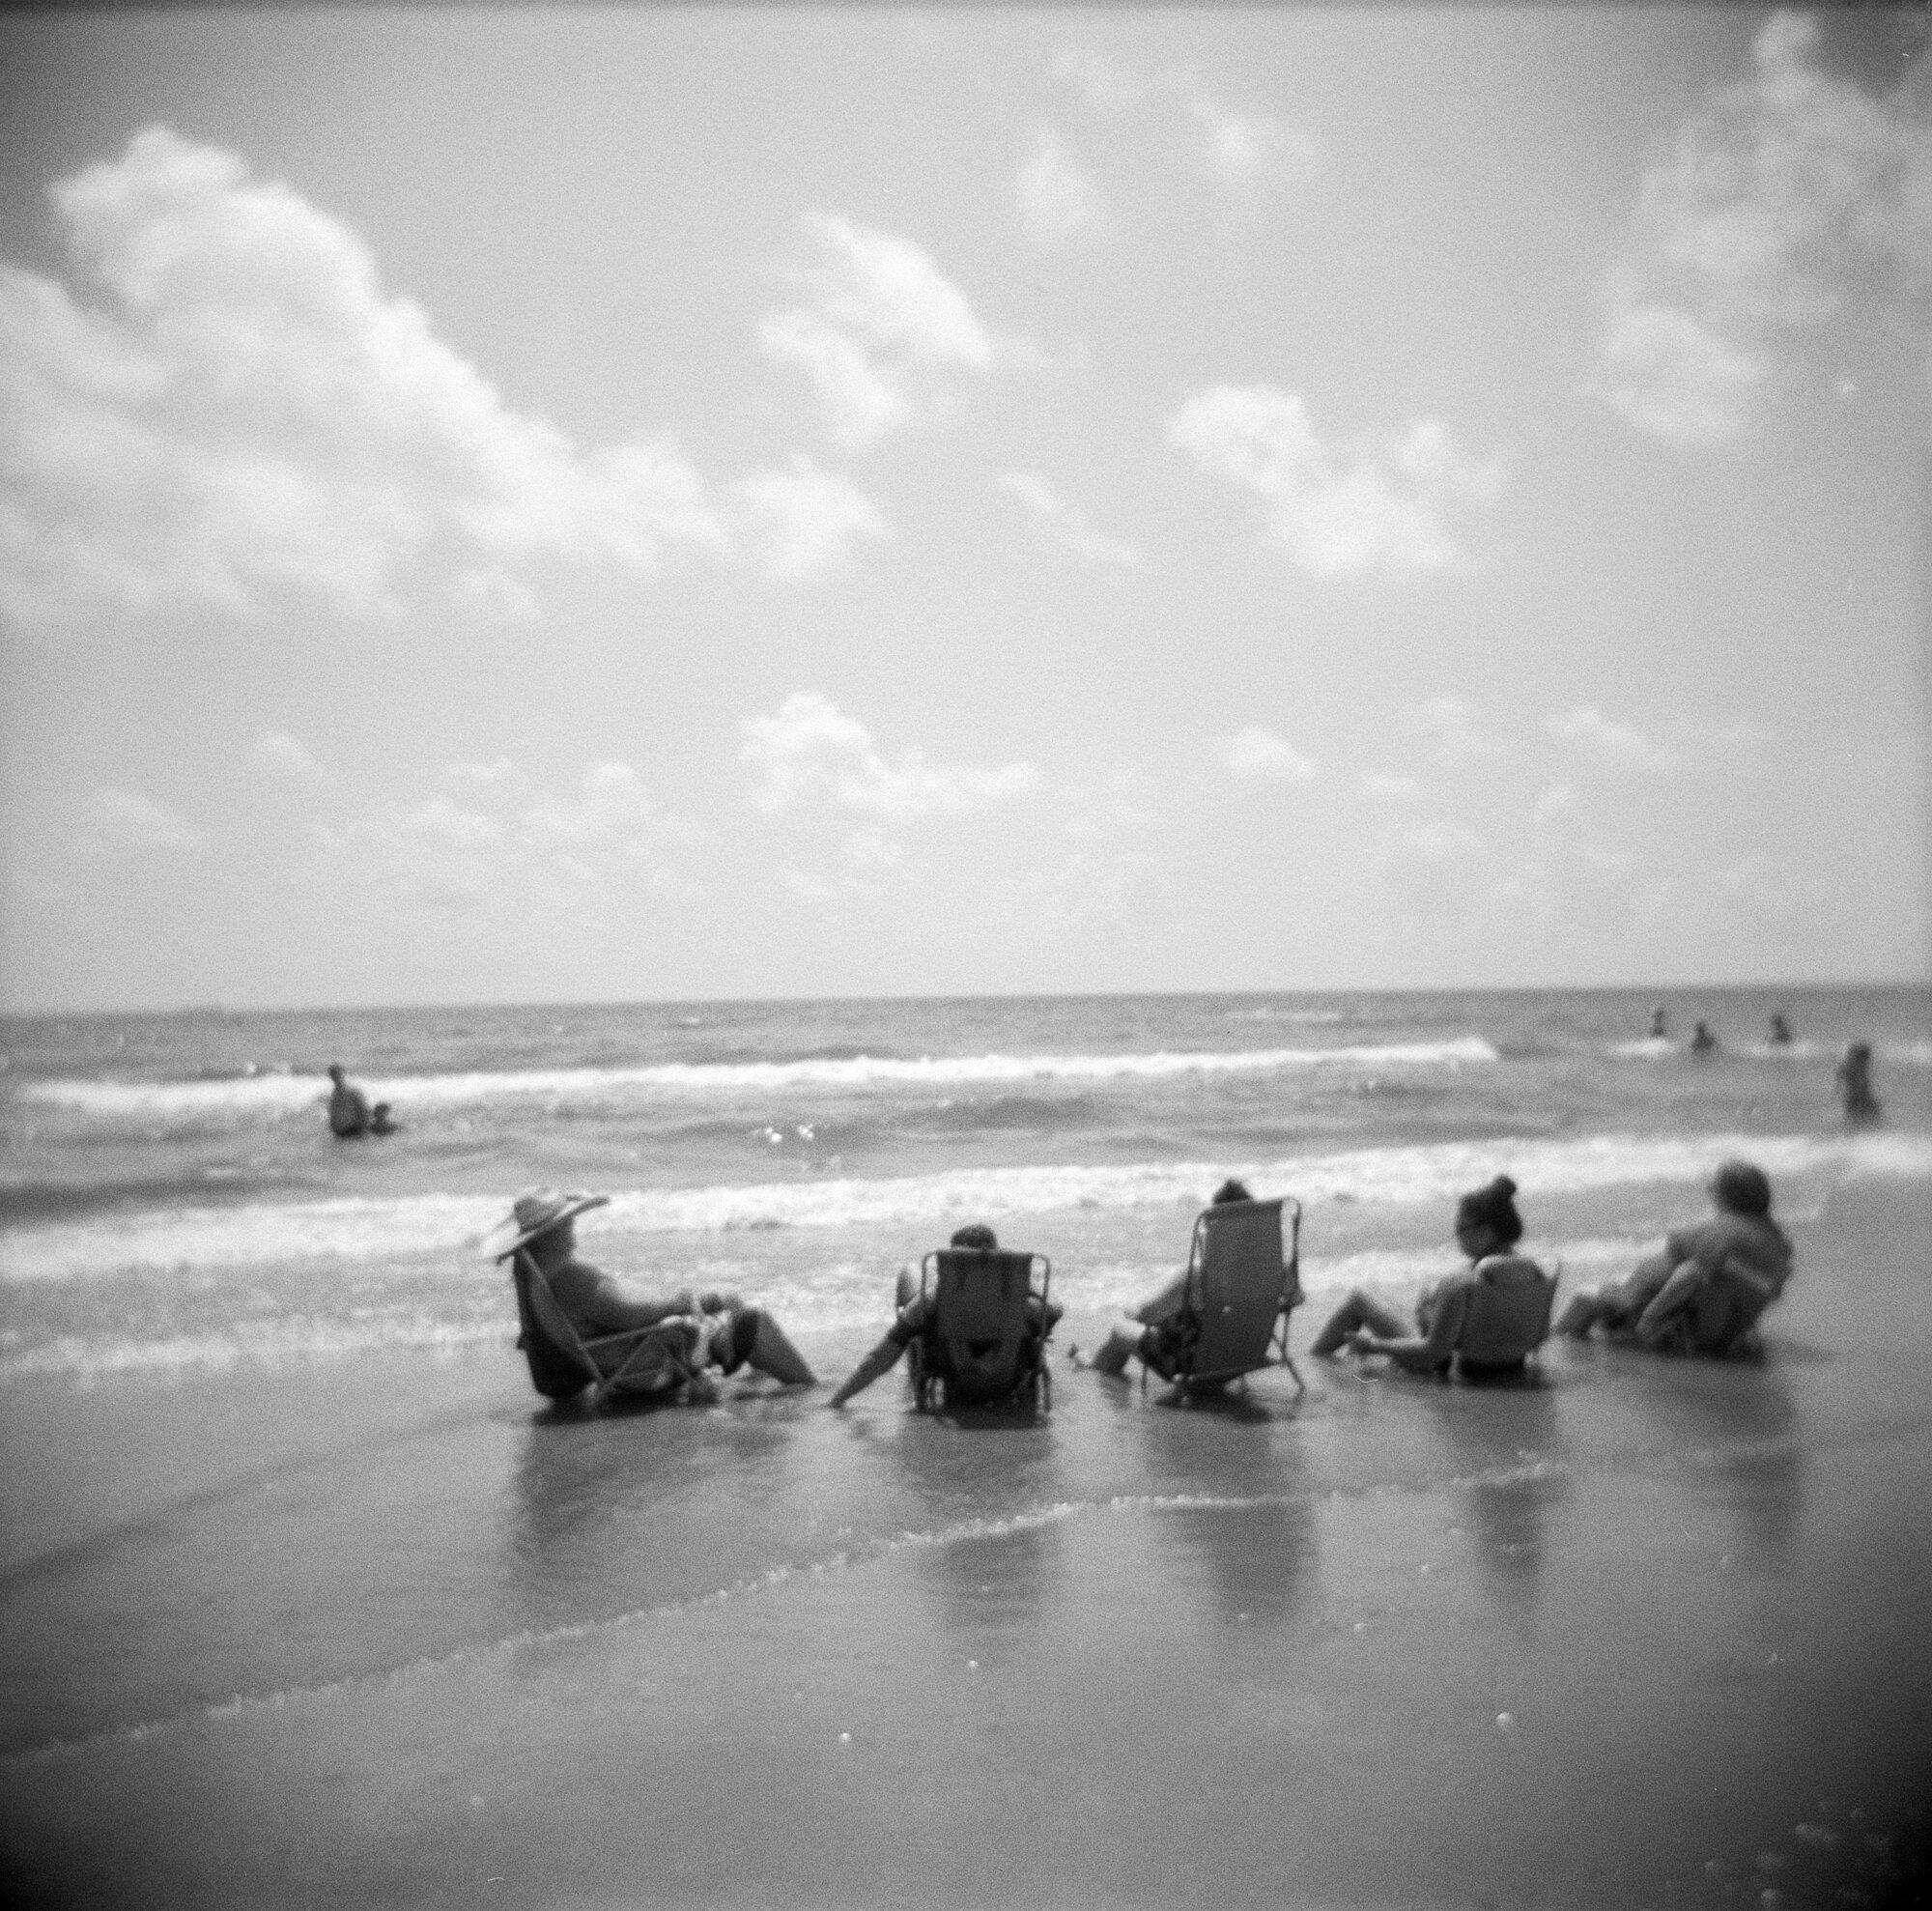 holga beach galveston labor day 2019 (14 of 7).jpg